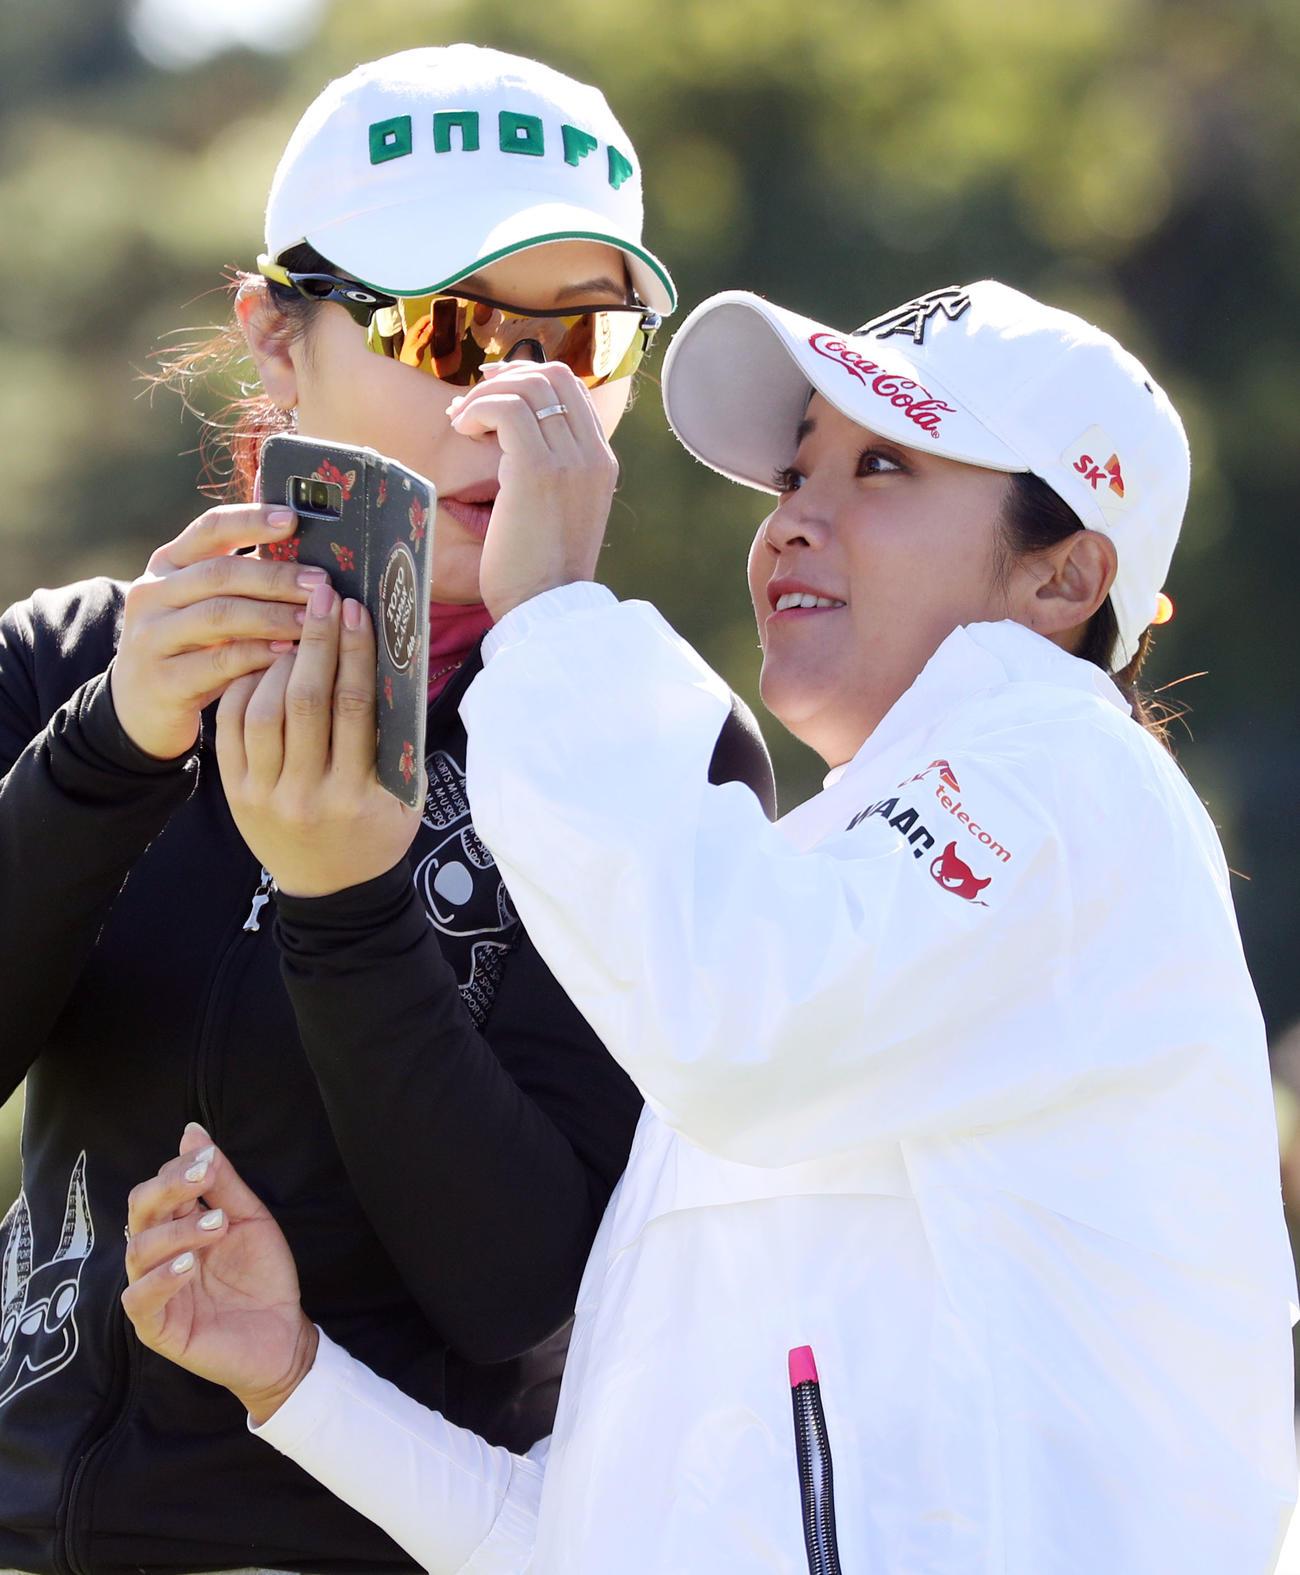 https://www.nikkansports.com/sports/golf/news/img/202011040000186-w1300_7.jpg